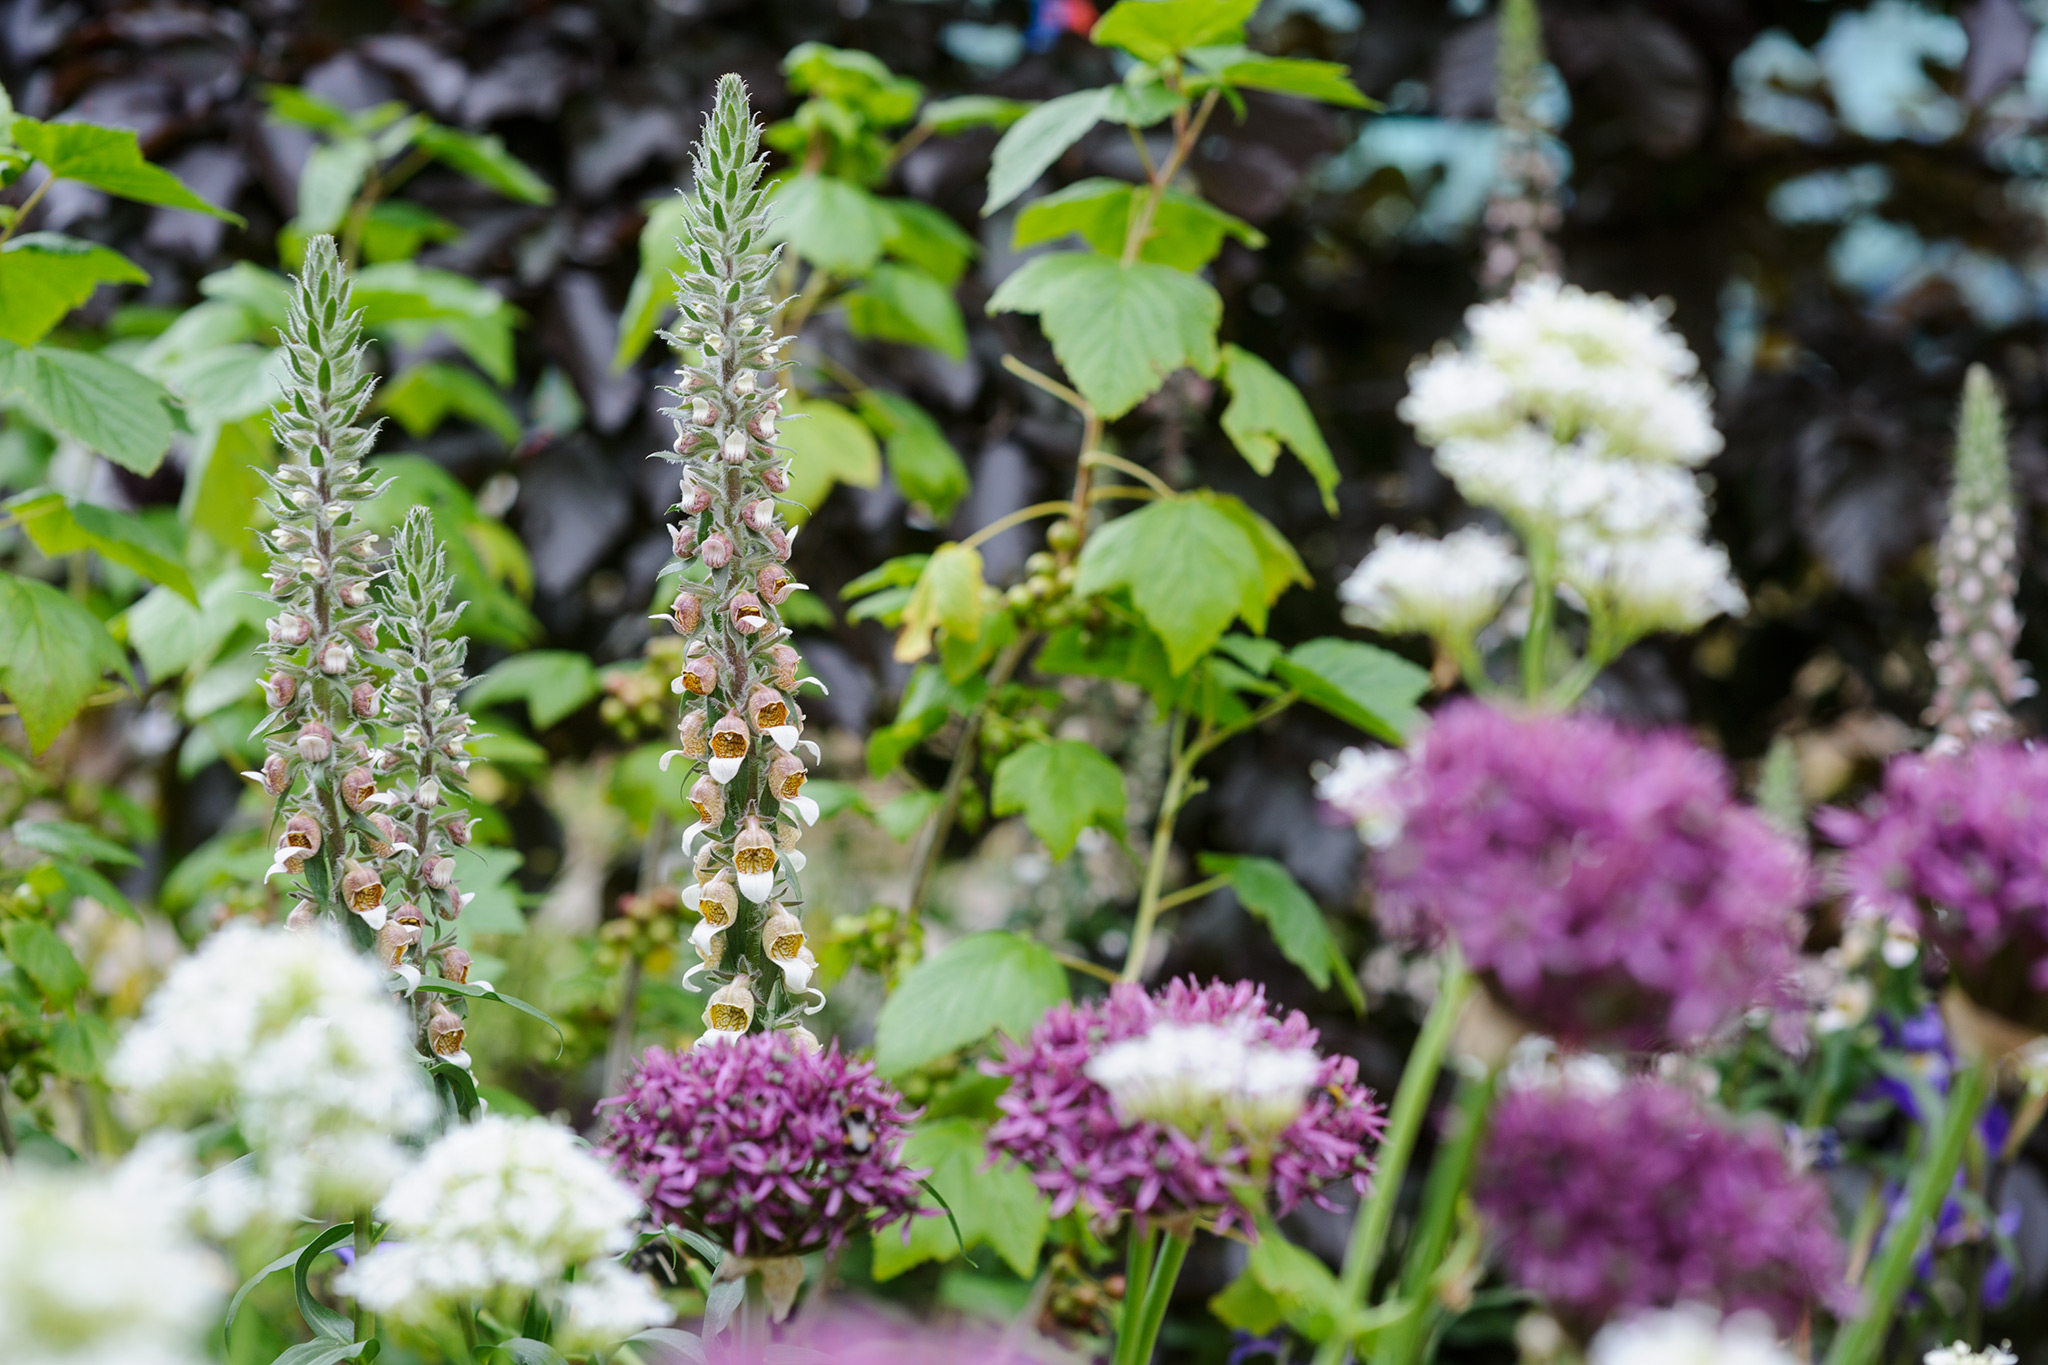 foxgloves-white-valerian-and-alliums-3